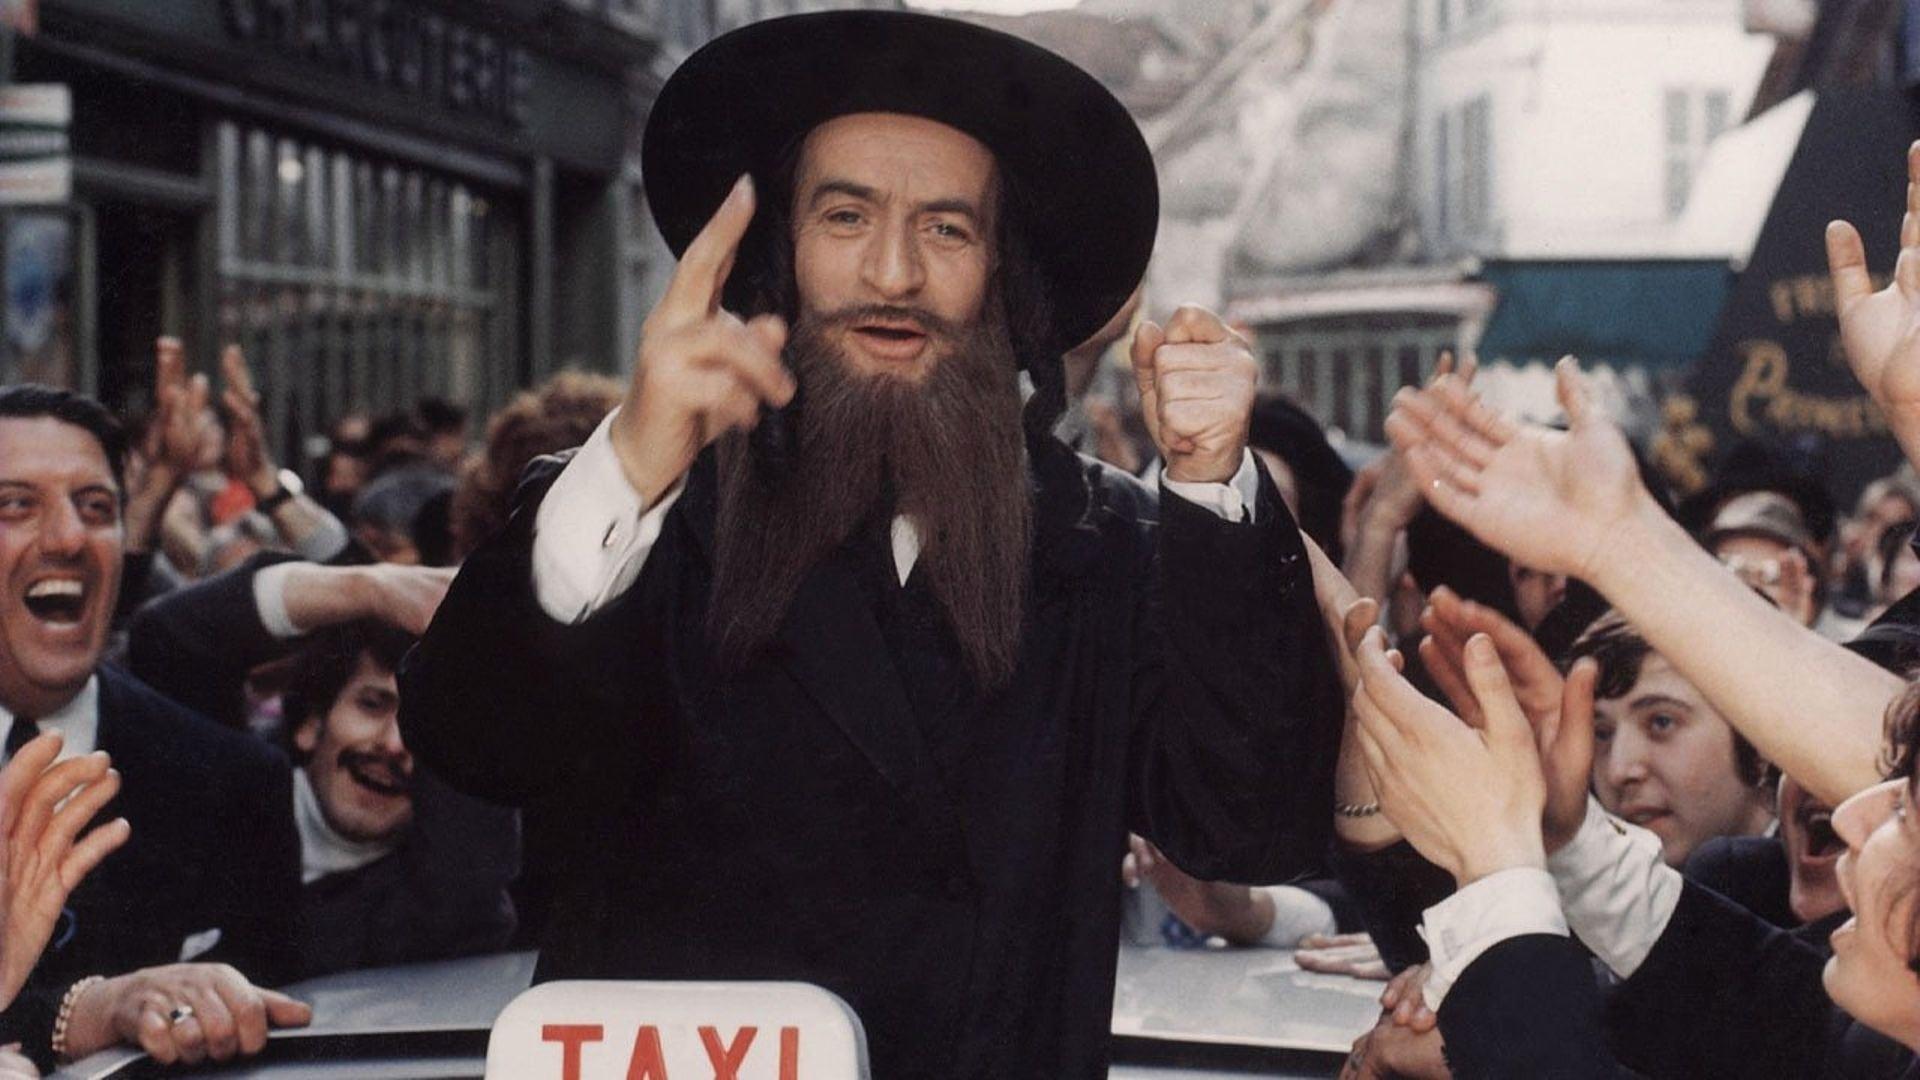 Regarder Les aventures de Rabbi Jacob en streaming gratuit